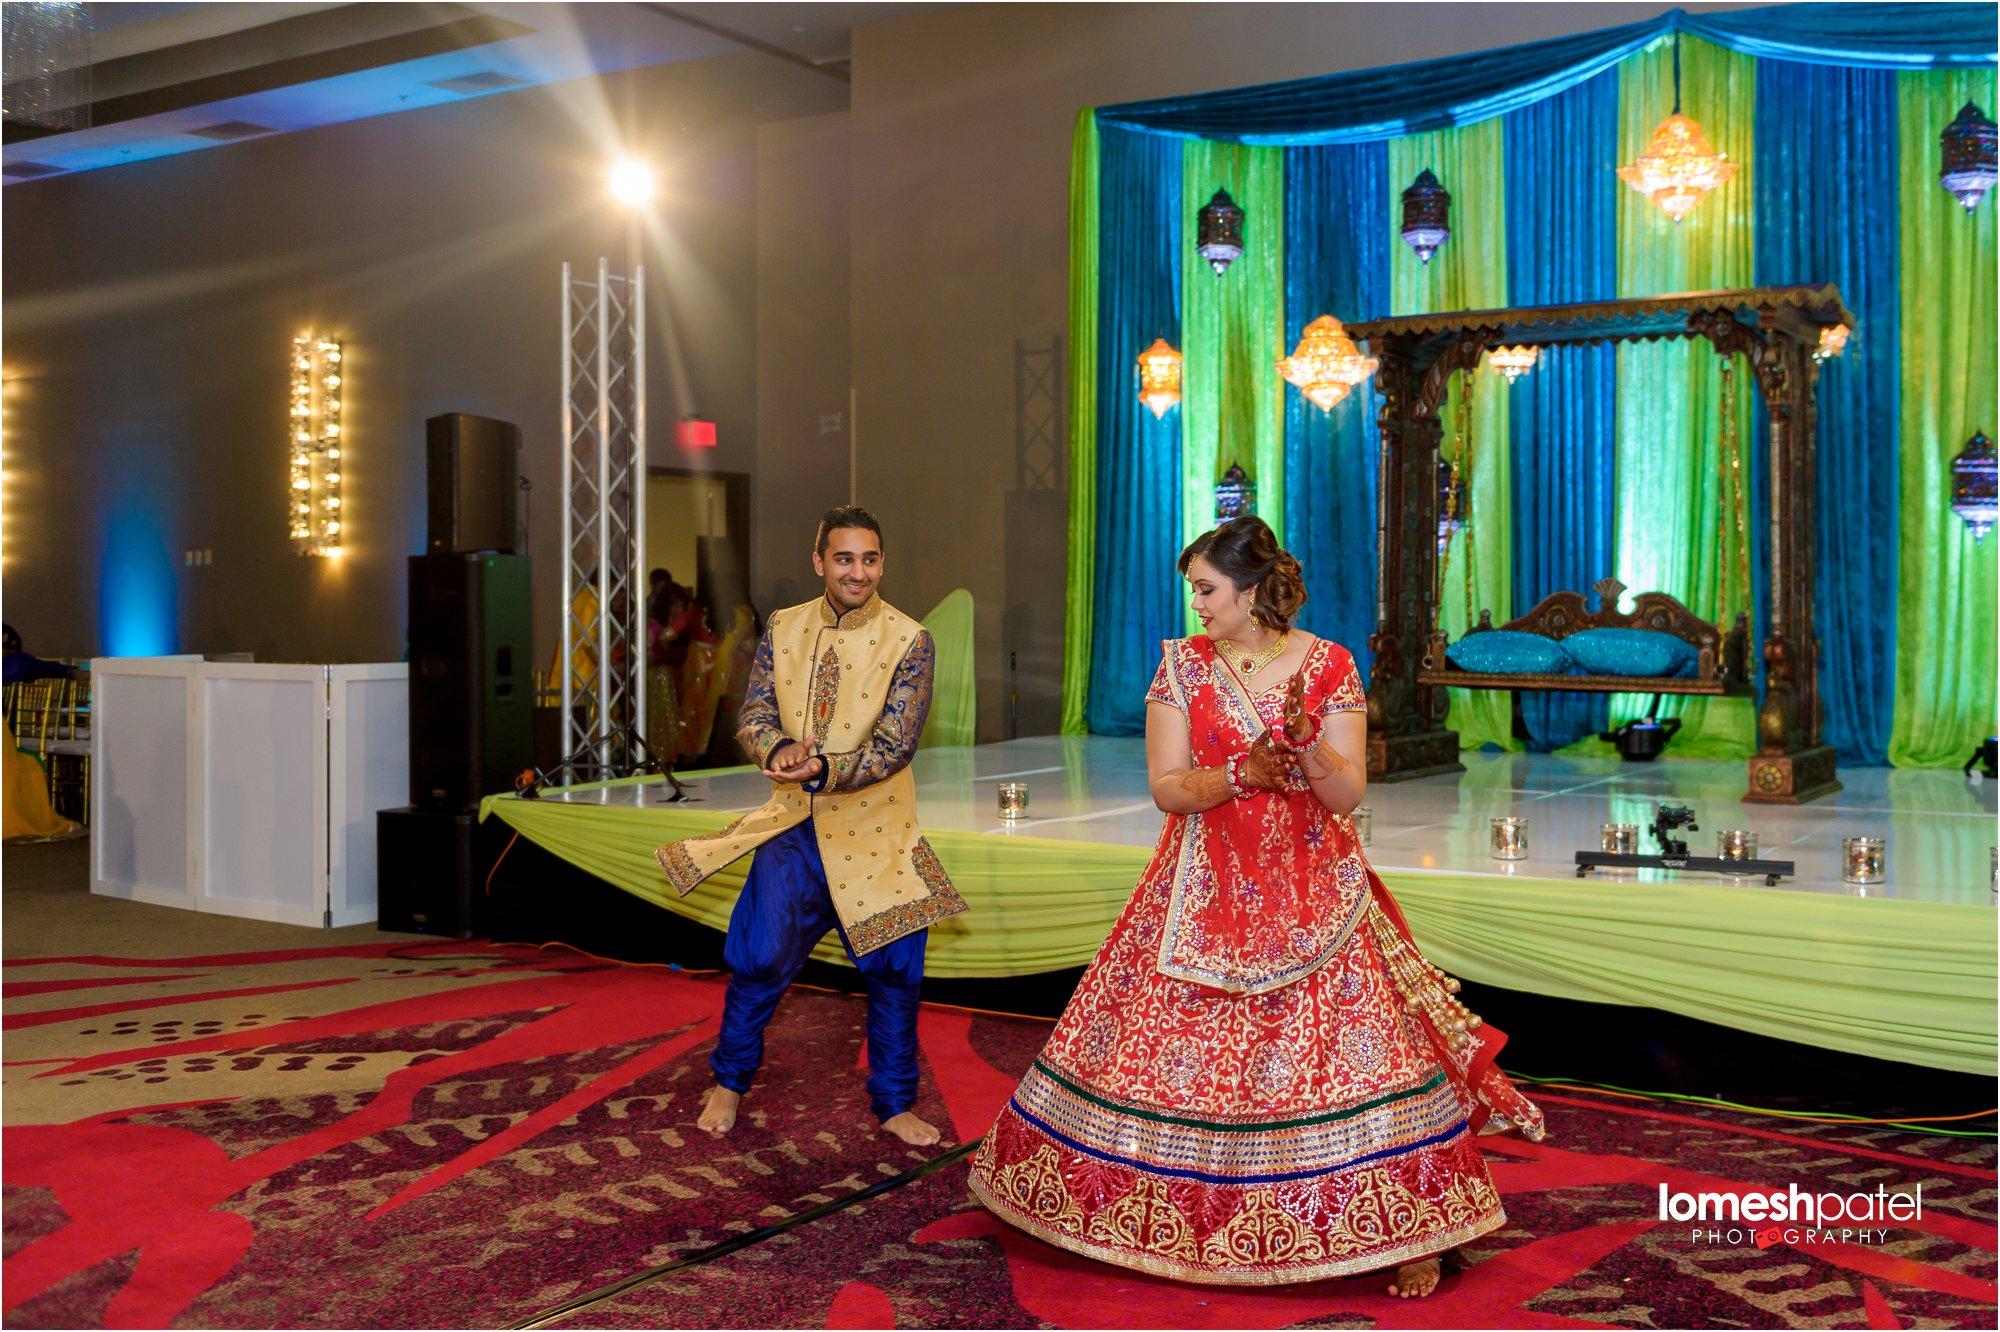 dallas_indian_wedding_0076.jpg